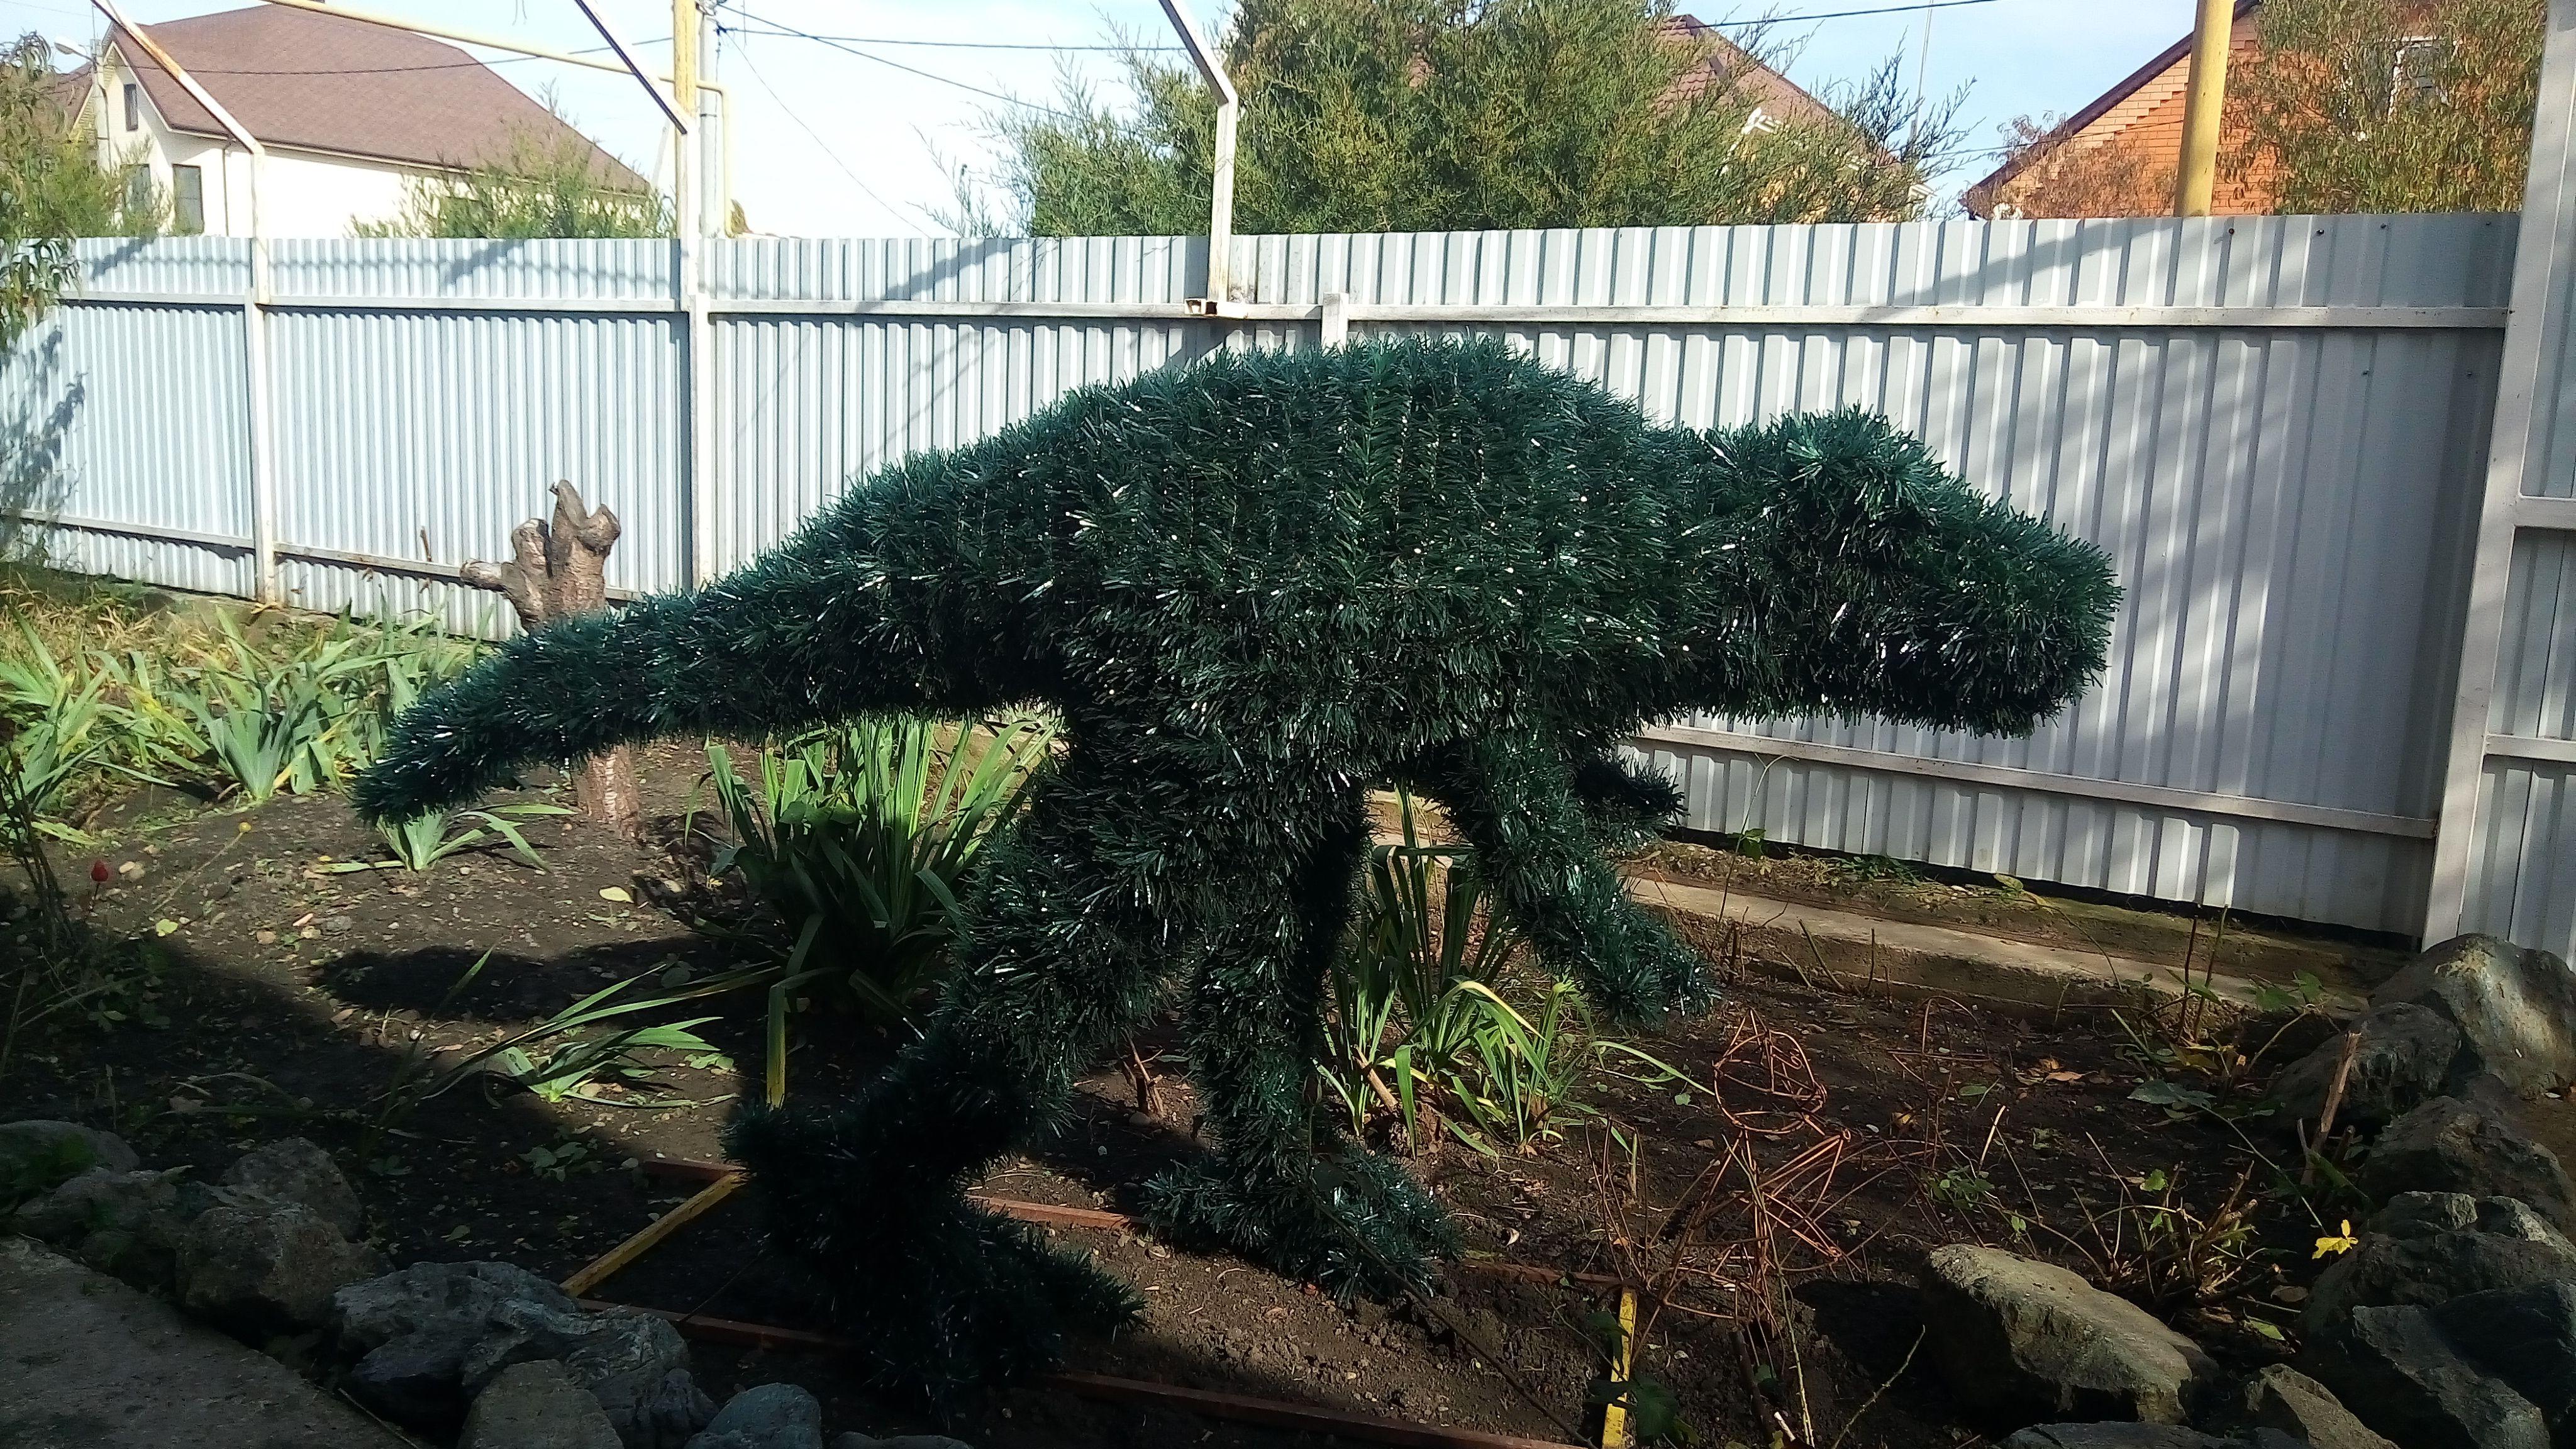 объект подарок дизайн динозавр топиарий арт сад